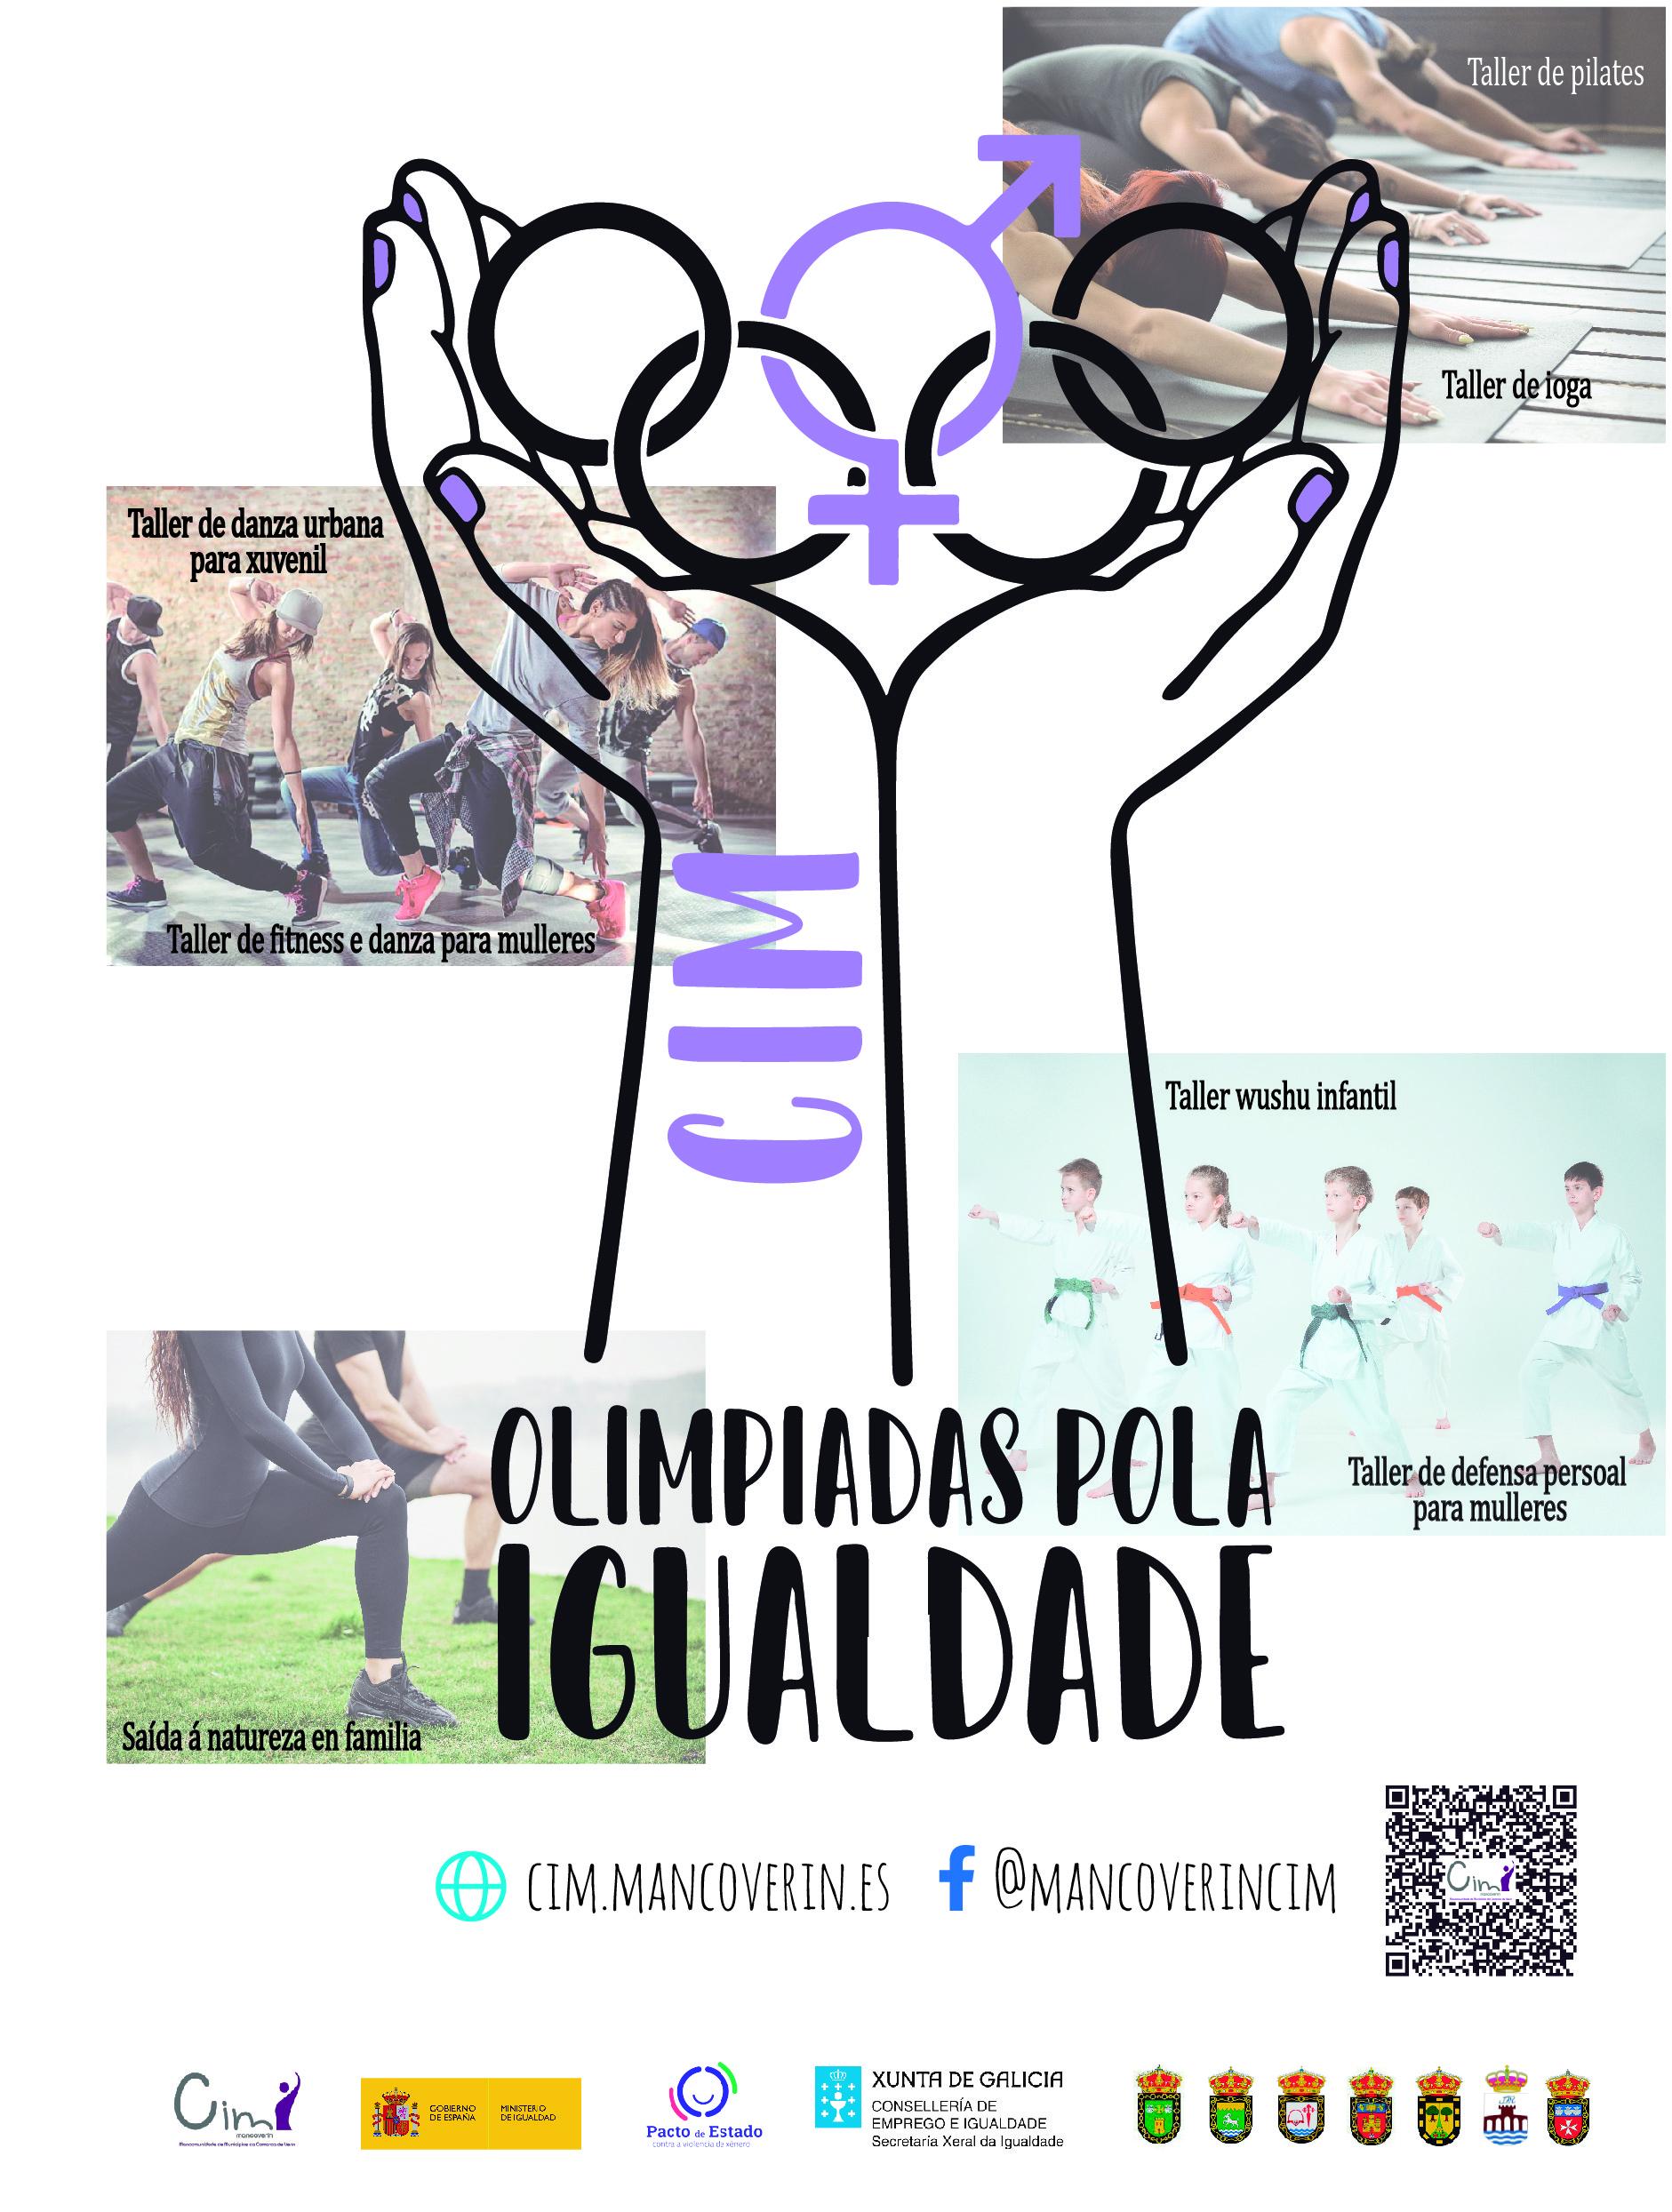 olimpiadas pola igualdade (1)